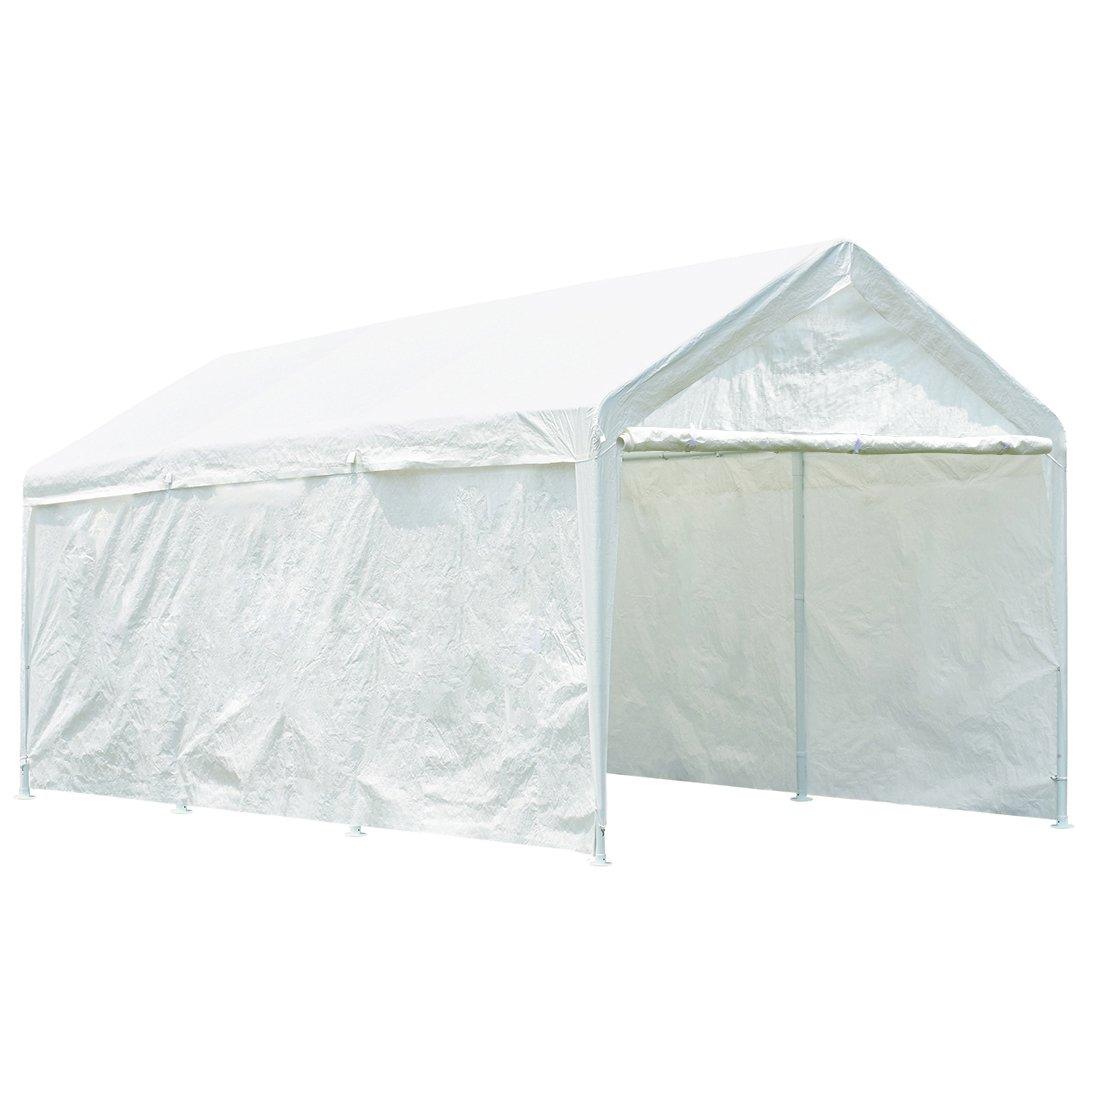 Quictent 20' x 10' Heavy Duty Carport Gazebo Canopy Party Tent Garage Car Shelter White